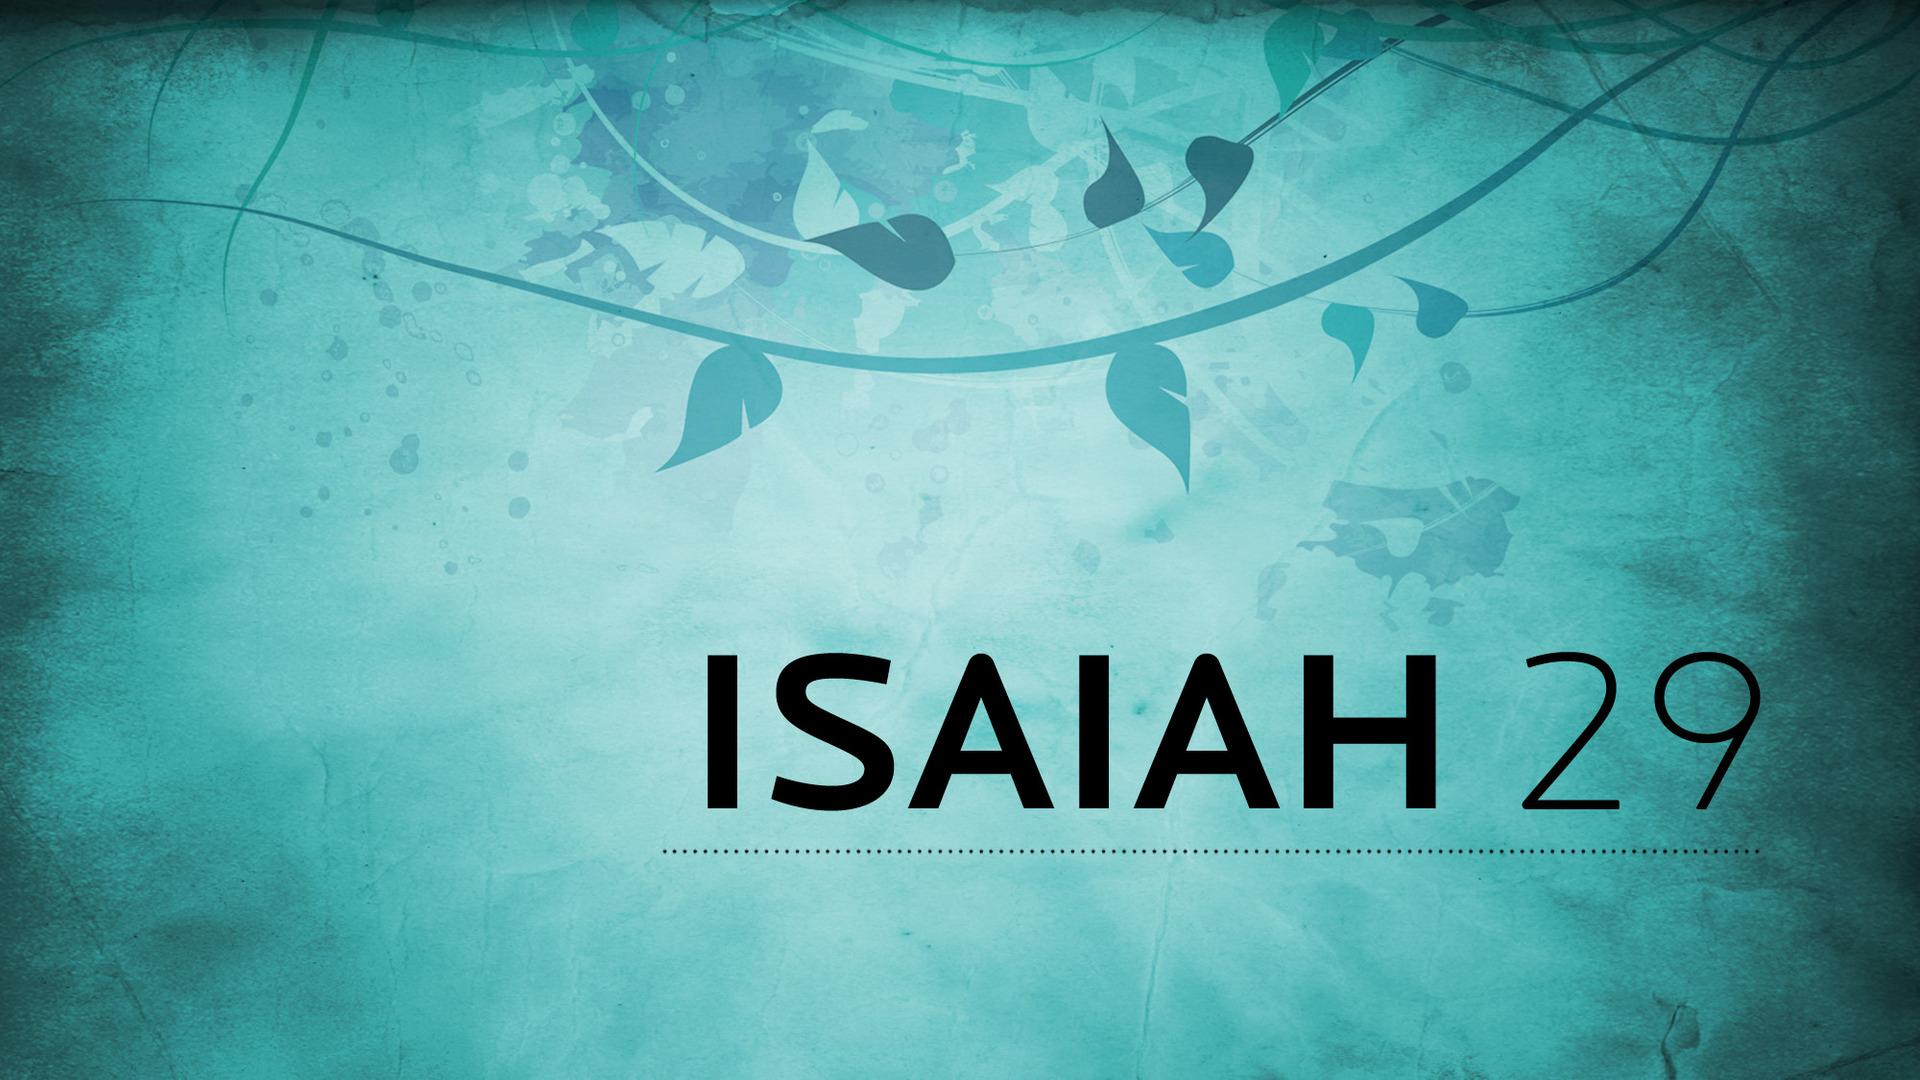 Isaiah 29